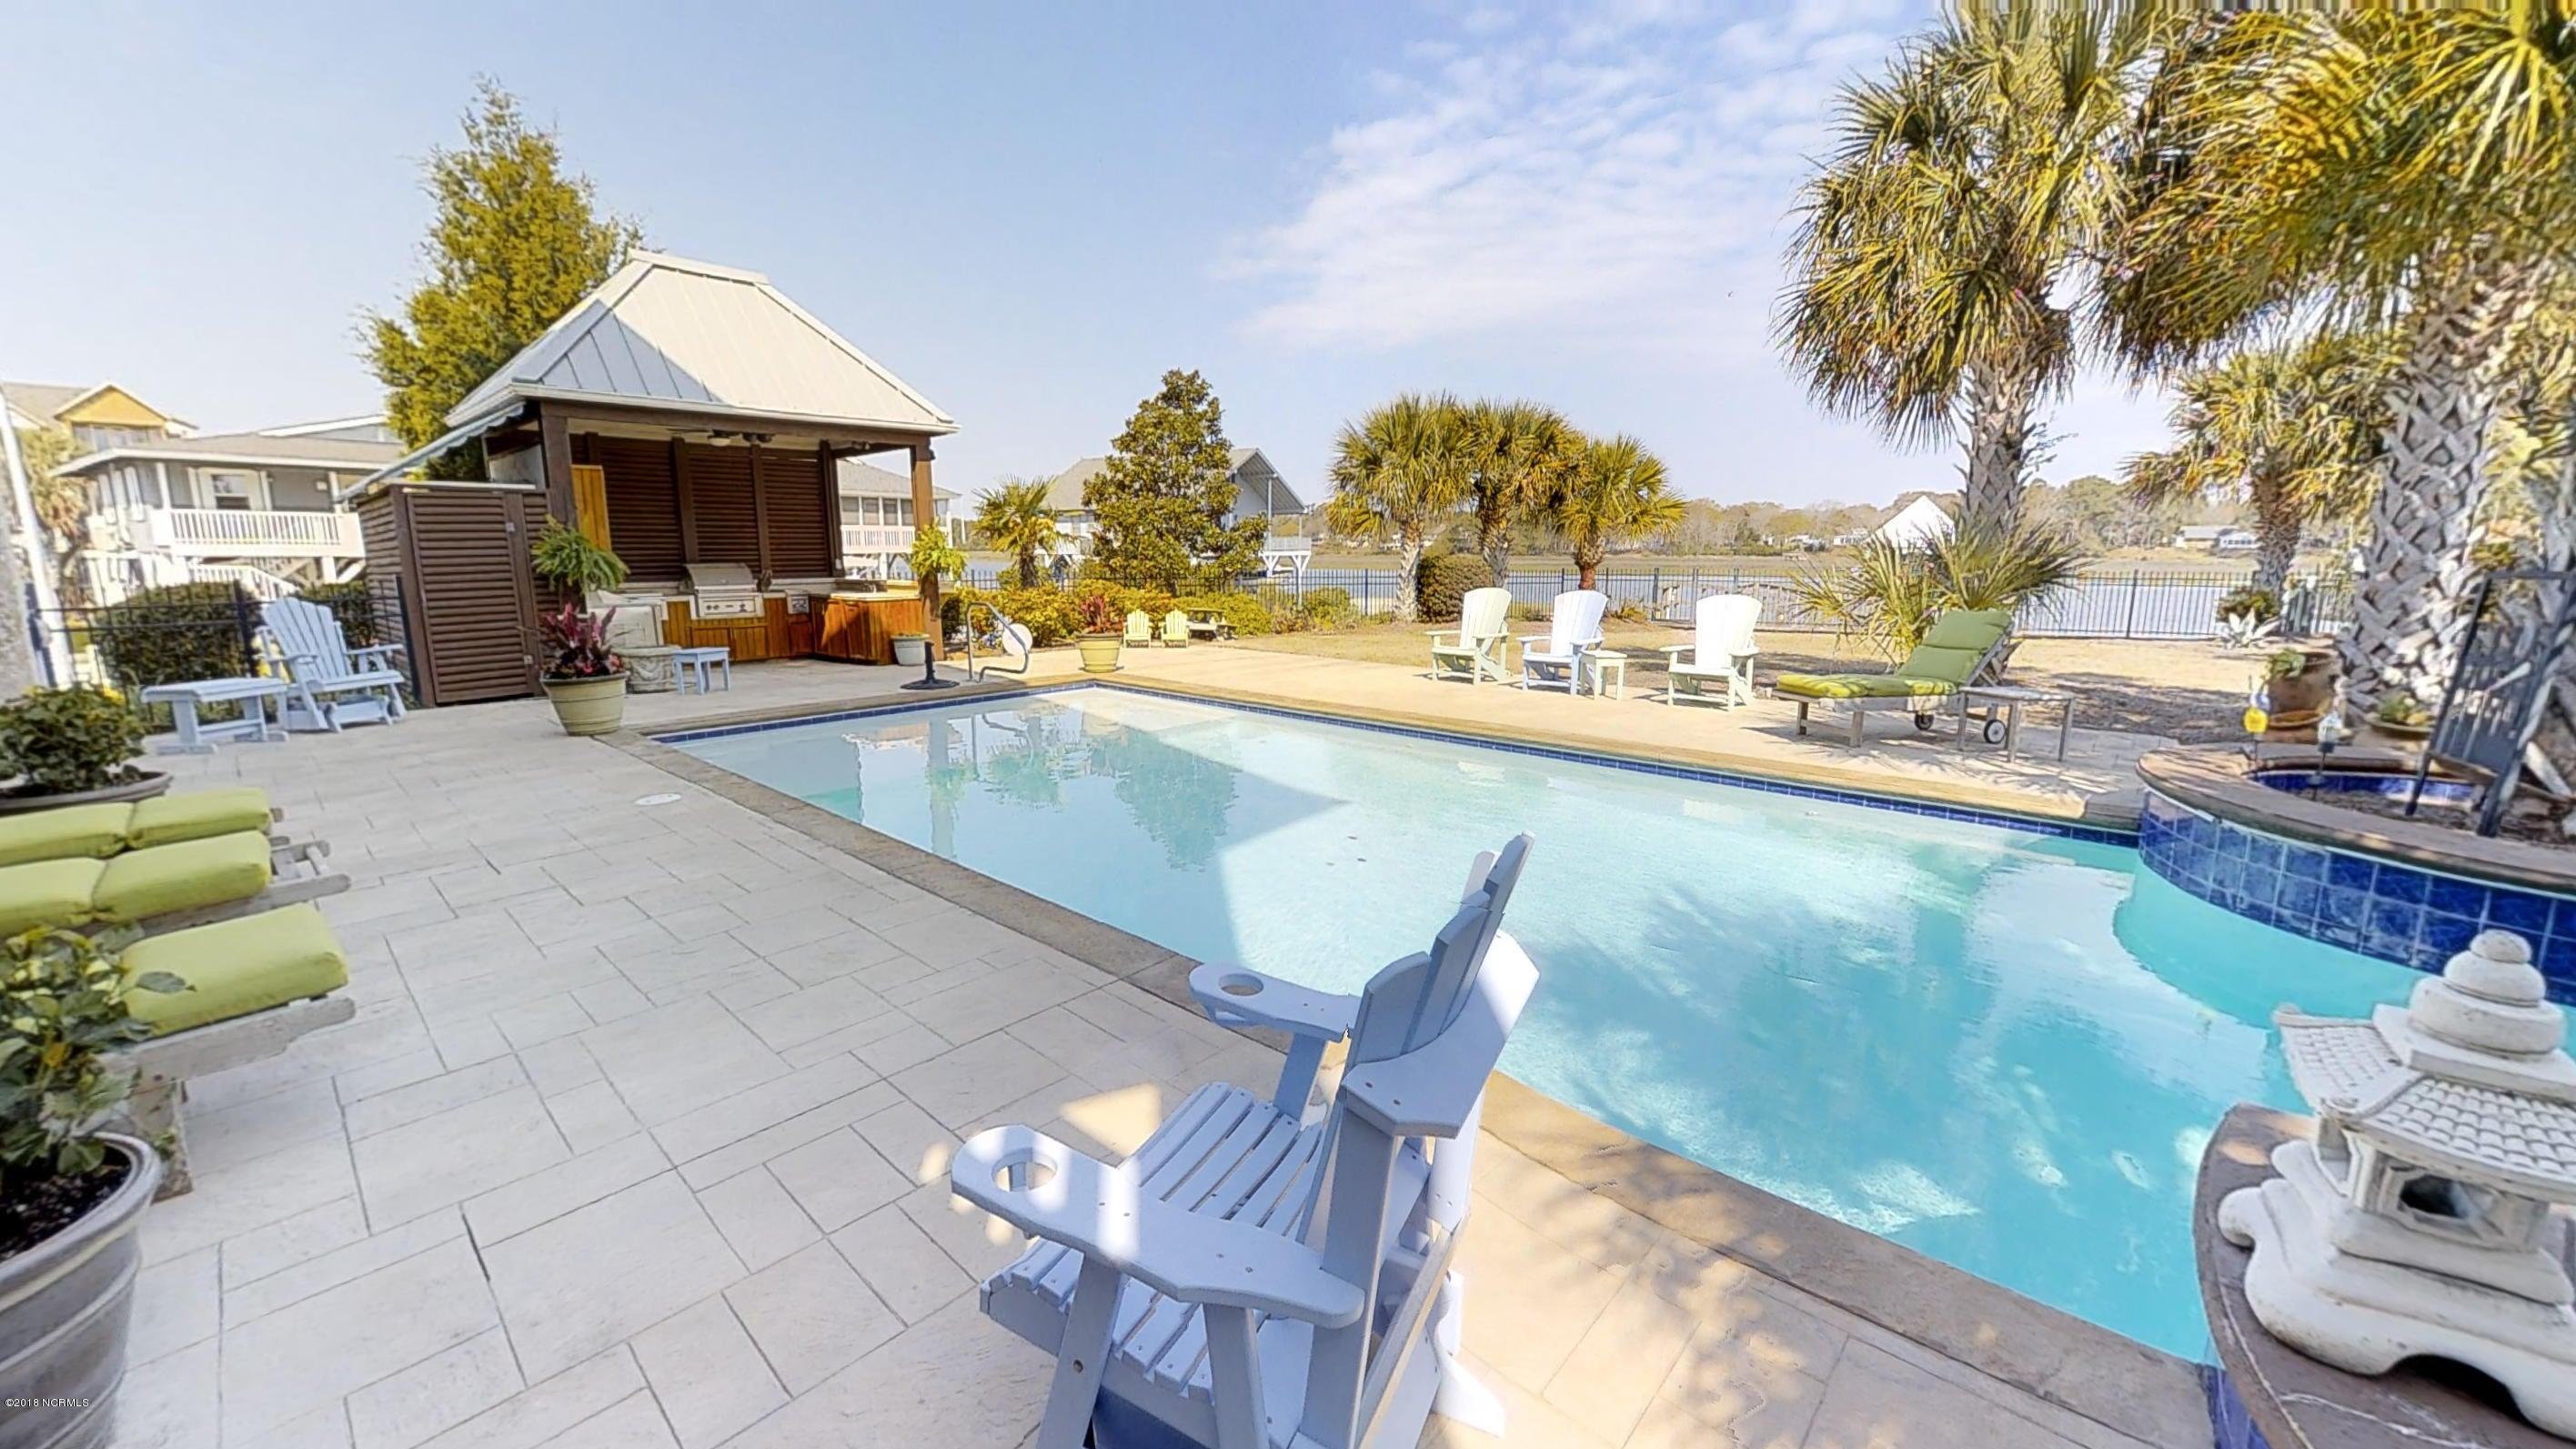 Ocean Isle Beach Real Estate - http://cdn.resize.sparkplatform.com/ncr/1024x768/true/20180414120415754699000000-o.jpg